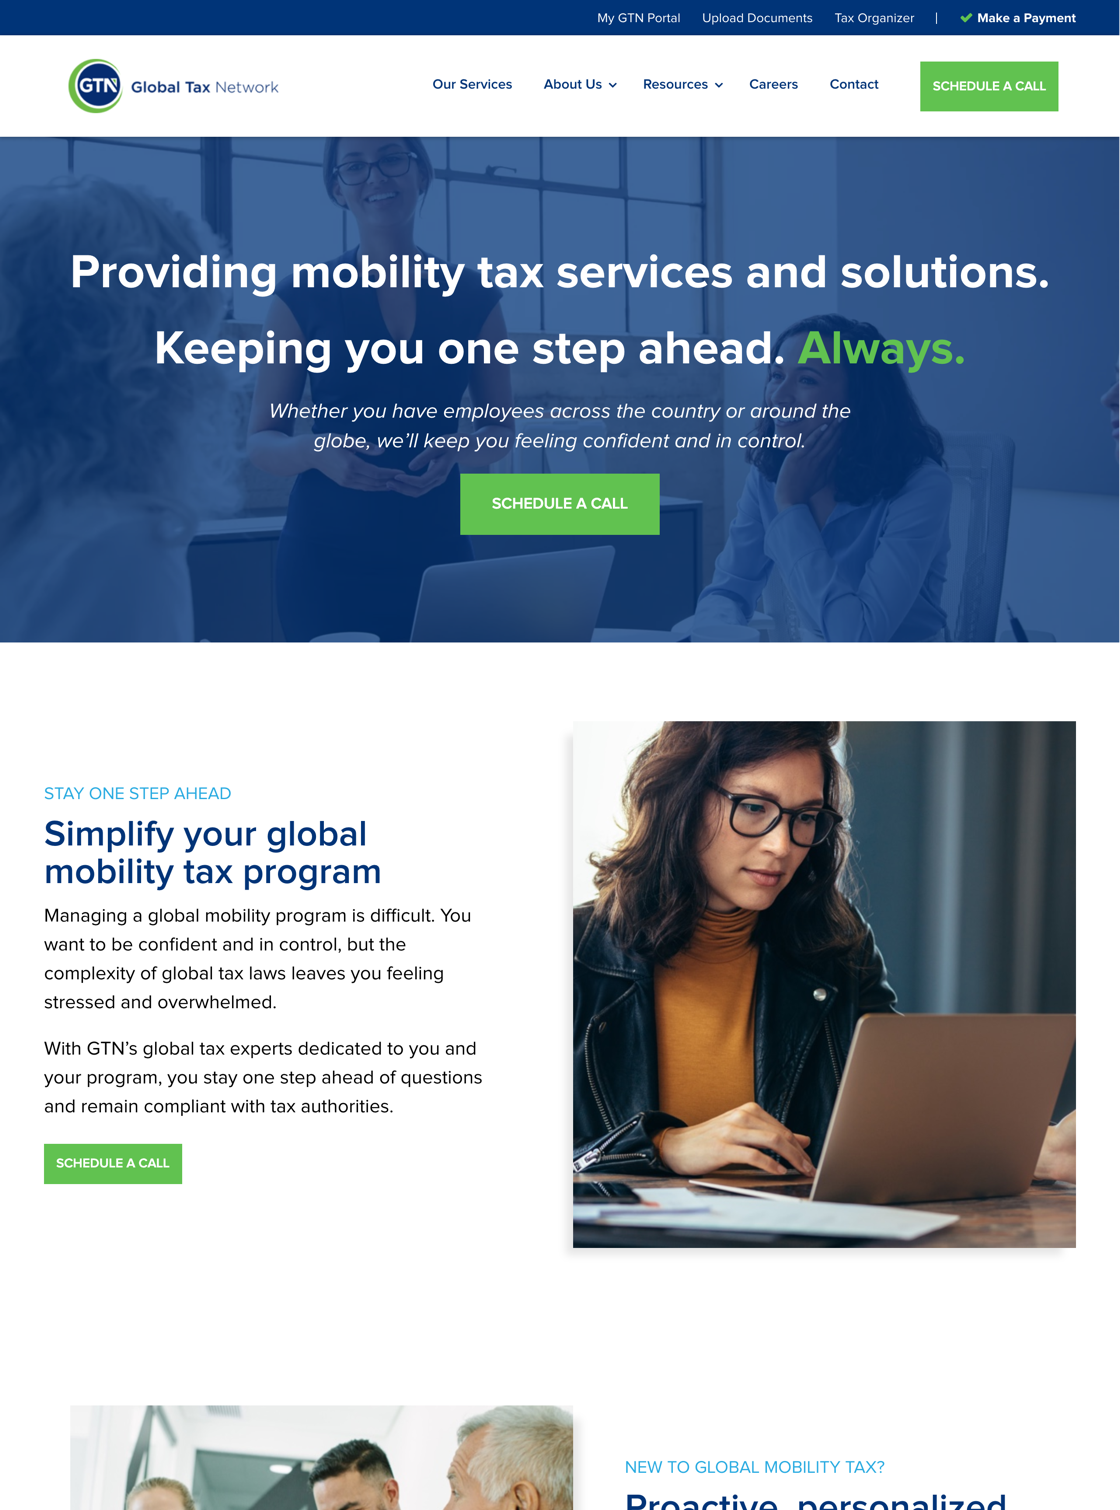 Global Tax Network website desktop view